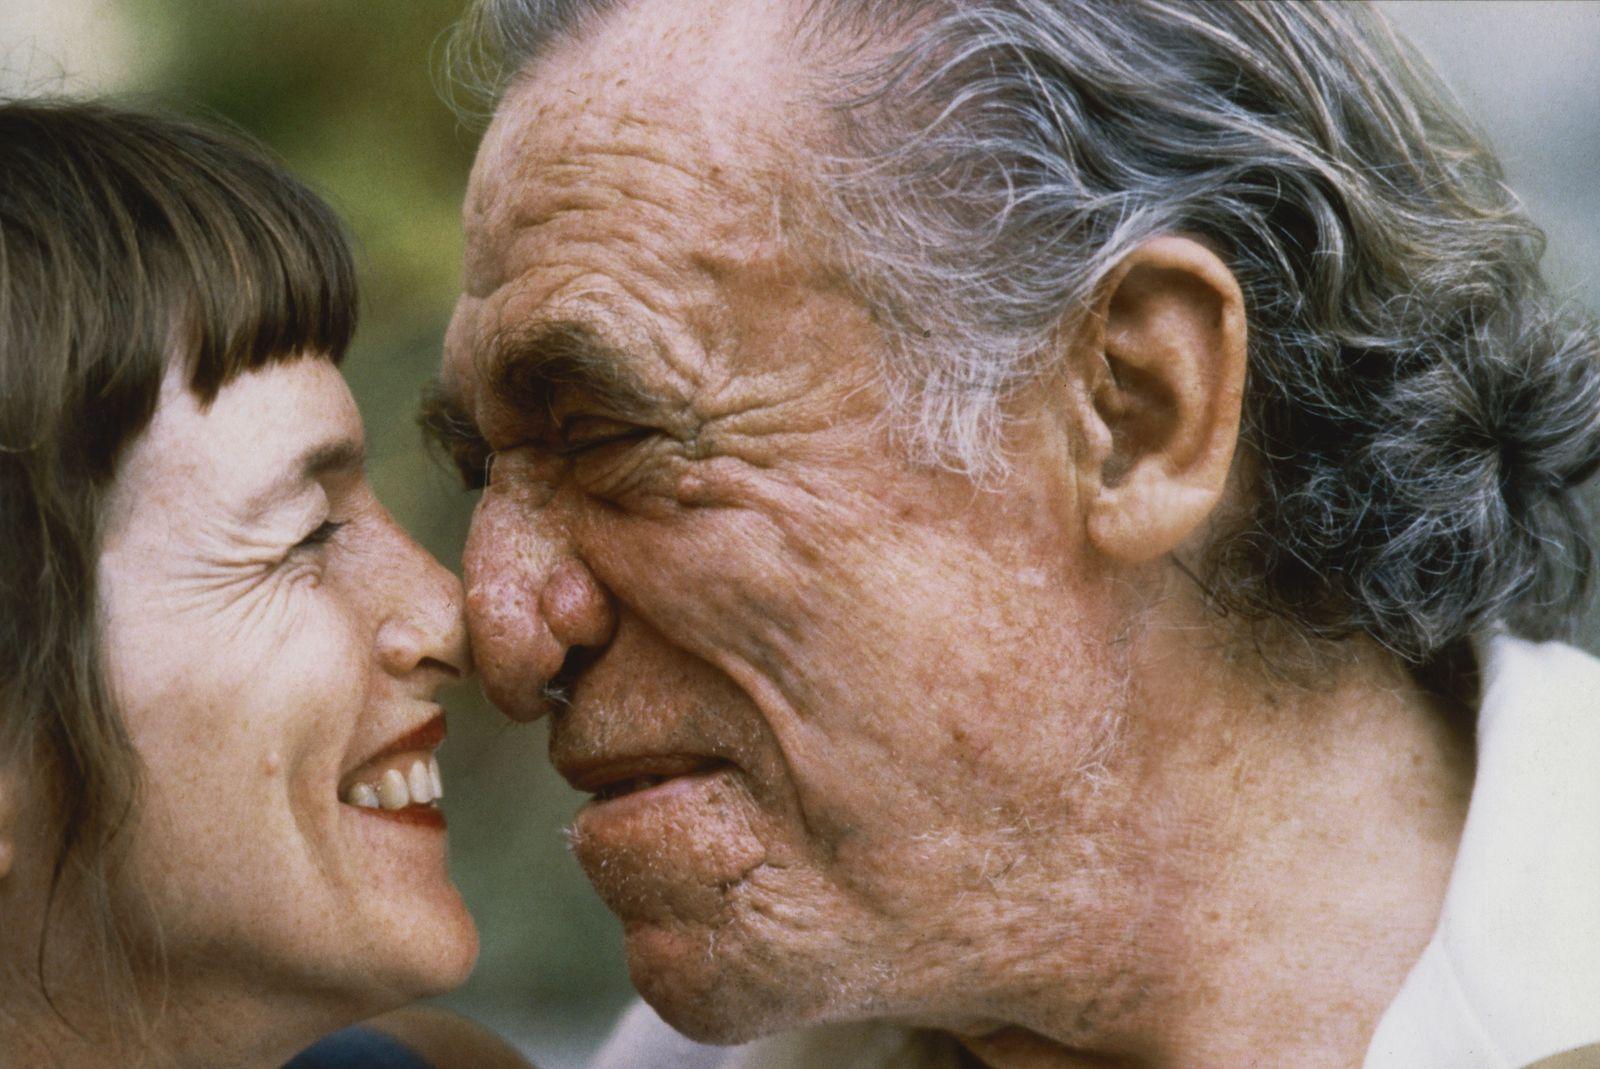 Bukowski, Charles mit seiner Frau Linda